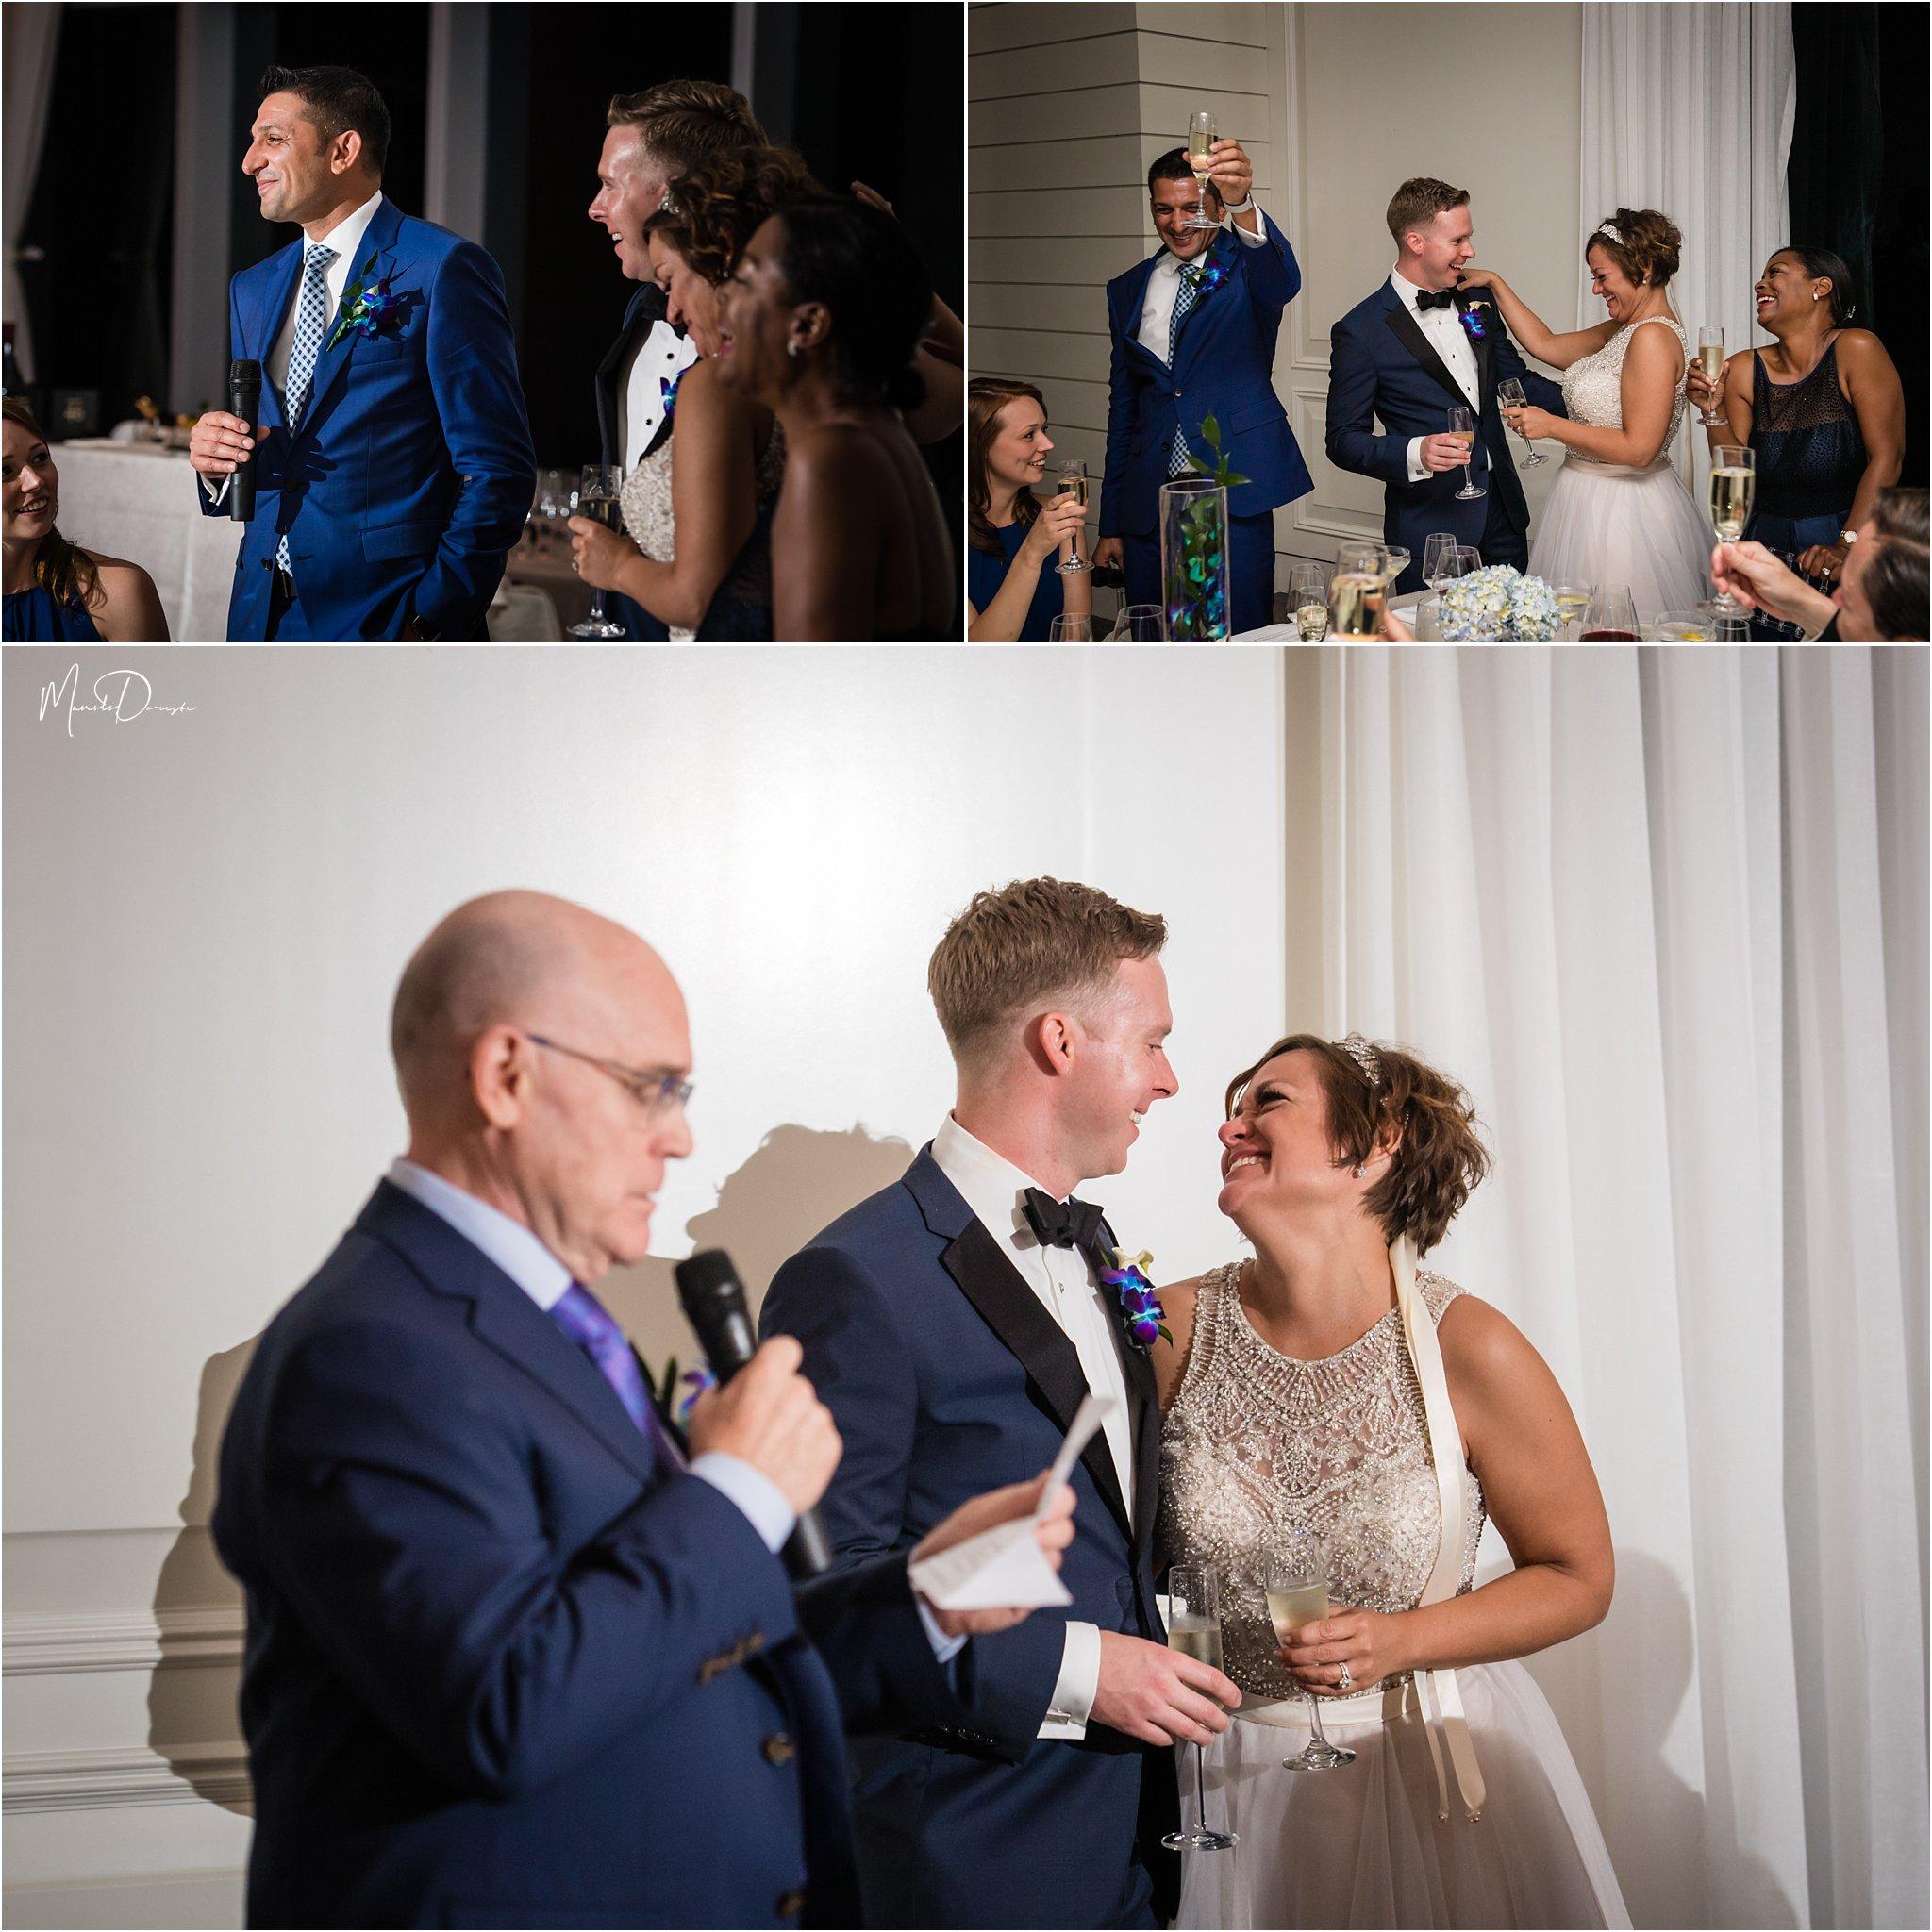 0459_ManoloDoreste_InFocusStudios_Wedding_Family_Photography_Miami_MiamiPhotographer.jpg